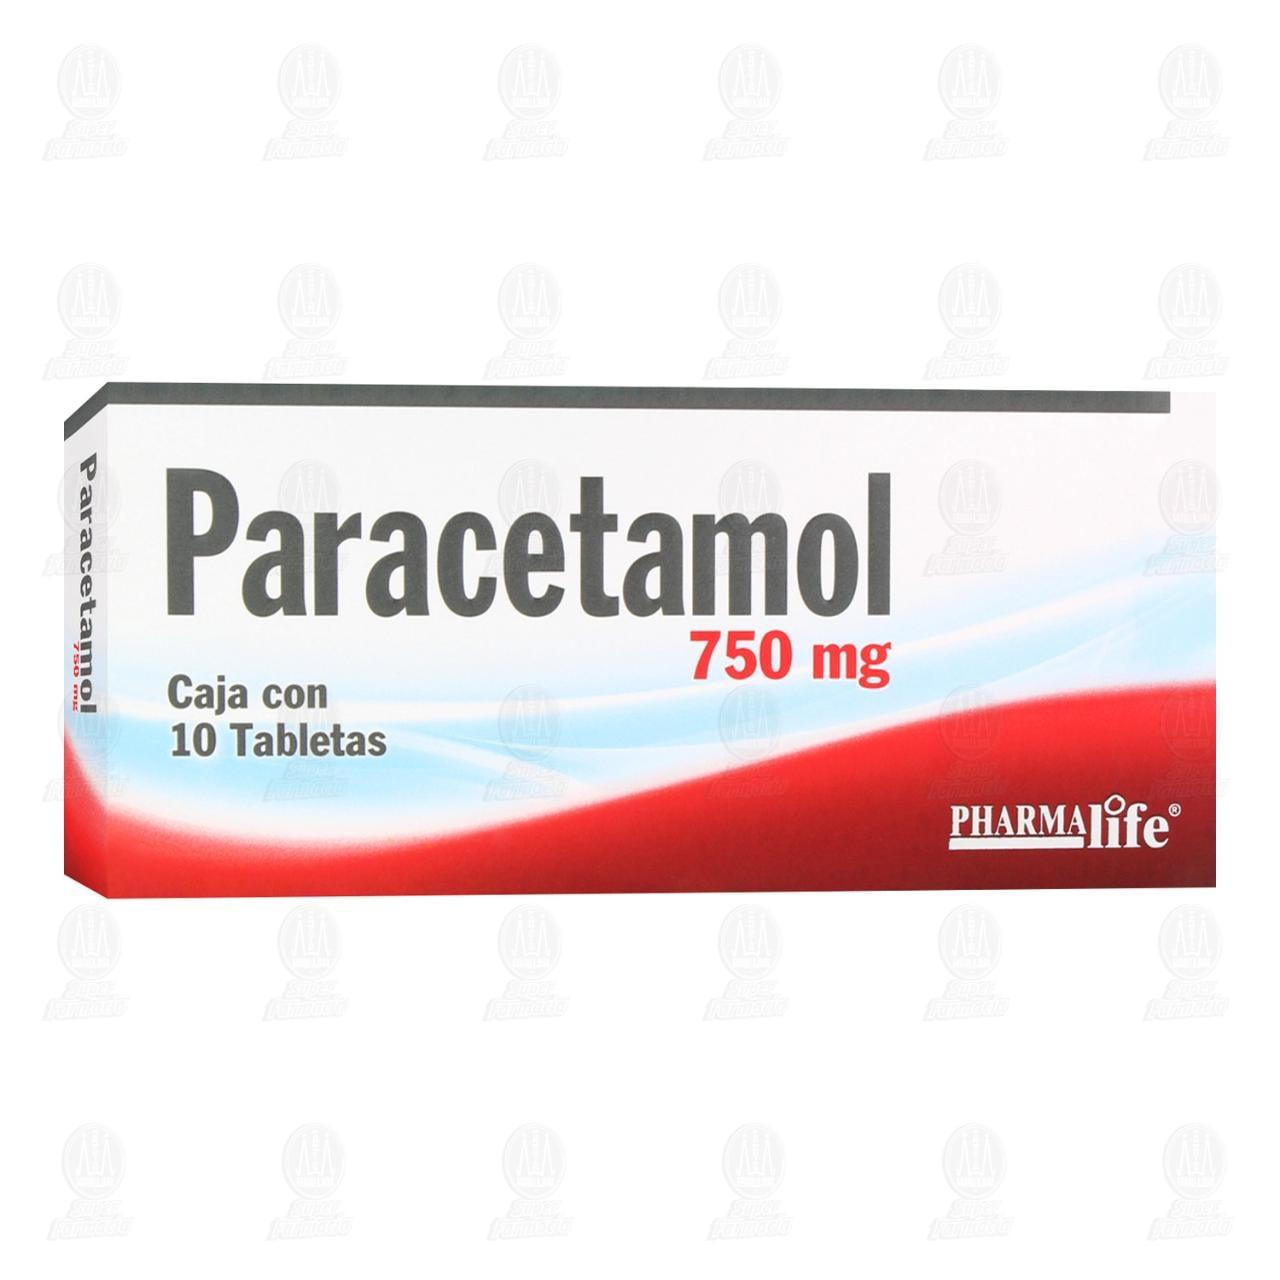 Comprar Paracetamol 750mg 10 Tabletas Pharmalife en Farmacias Guadalajara